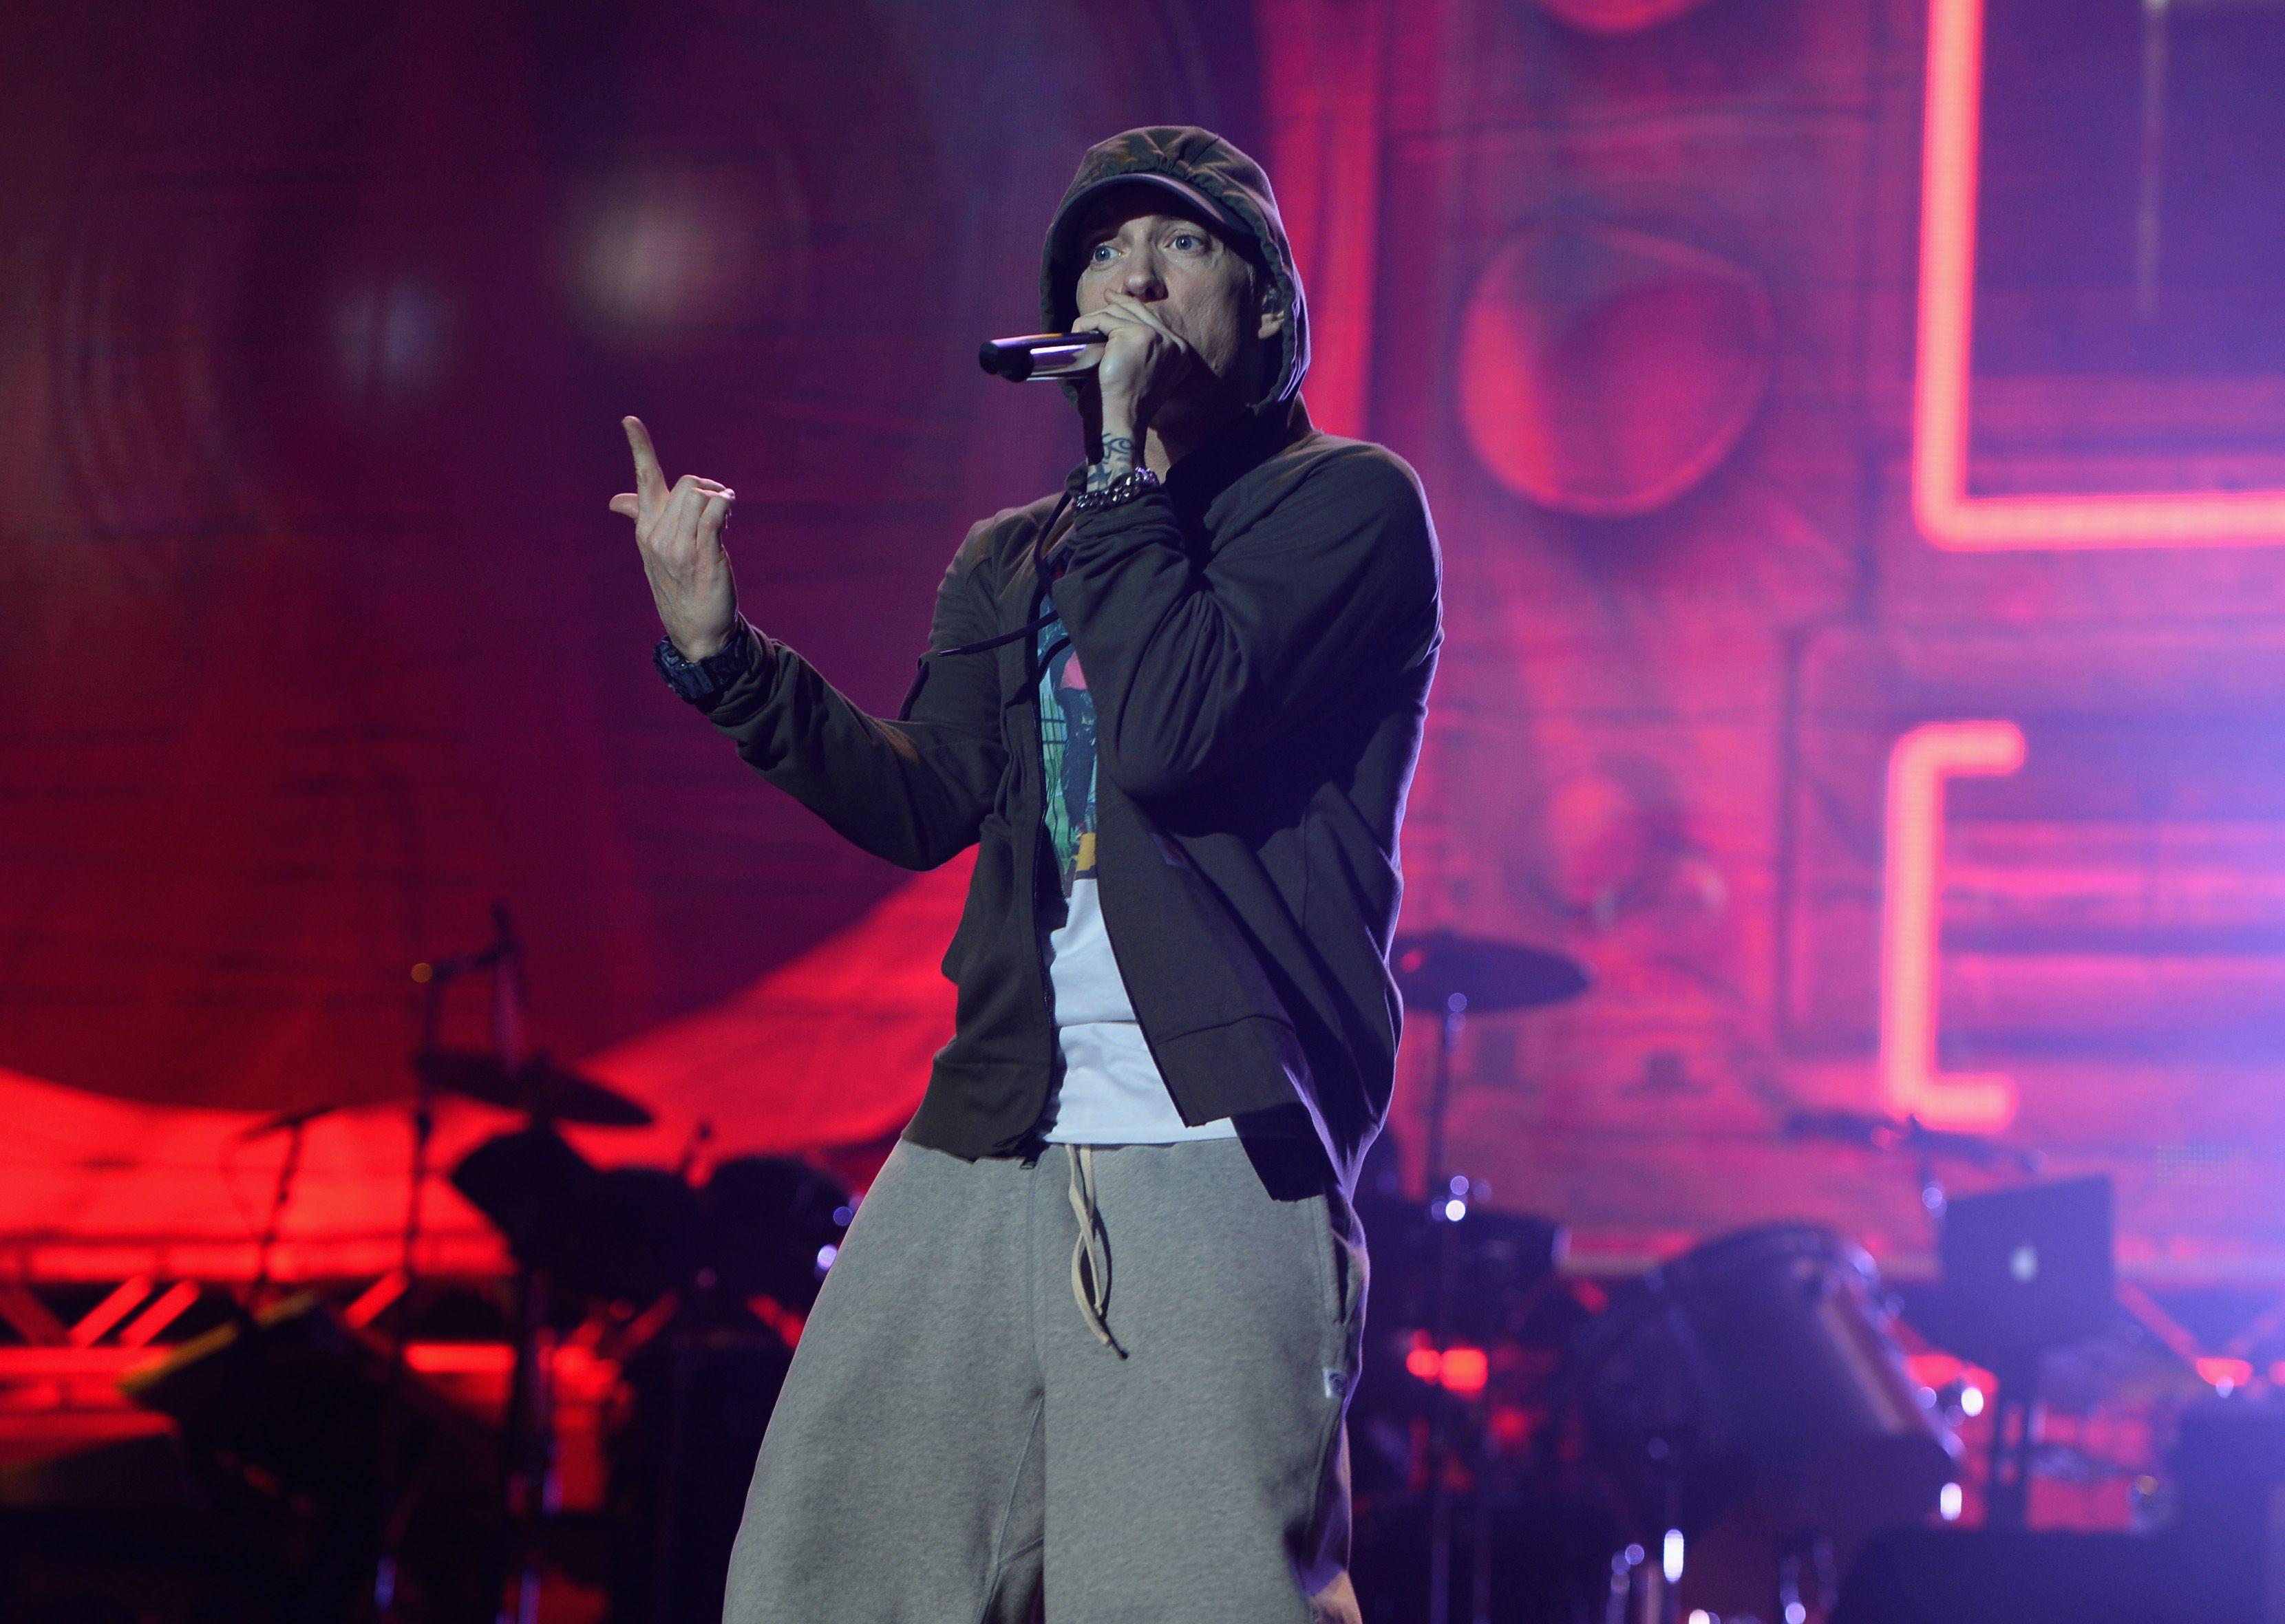 Eminem performing a rap on stage.